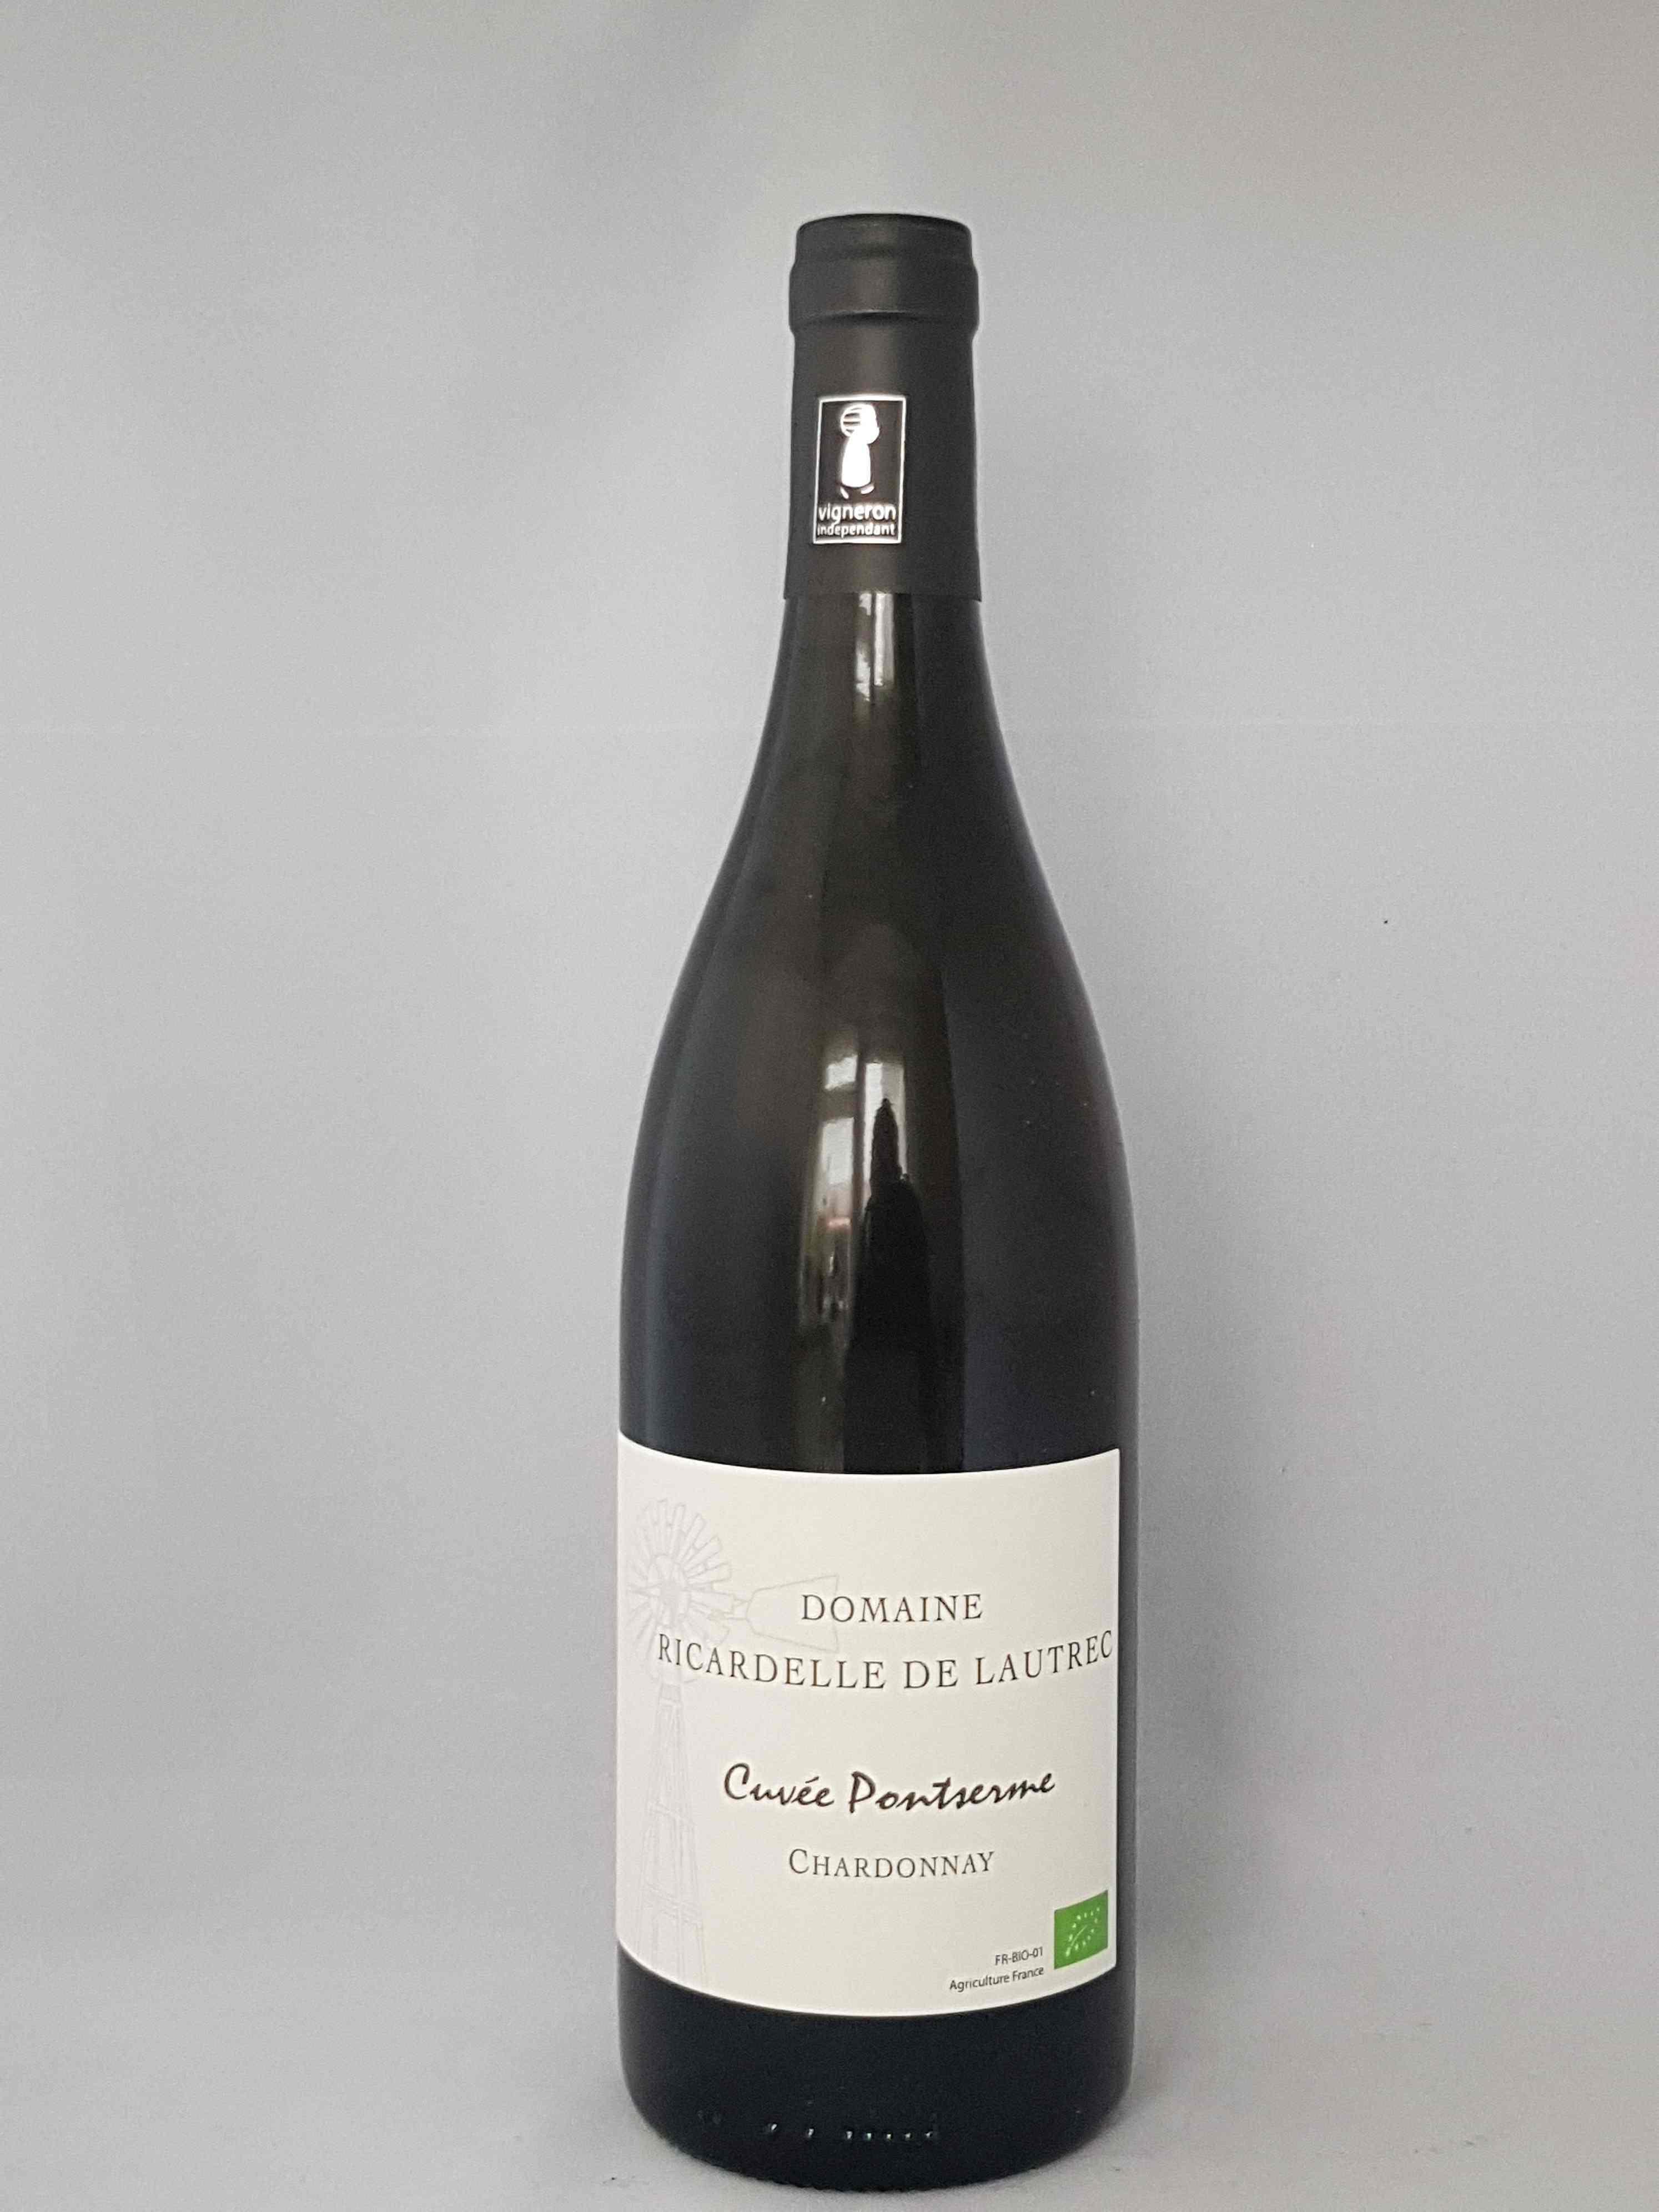 Chardonnay Cuvee Pontserme 2017